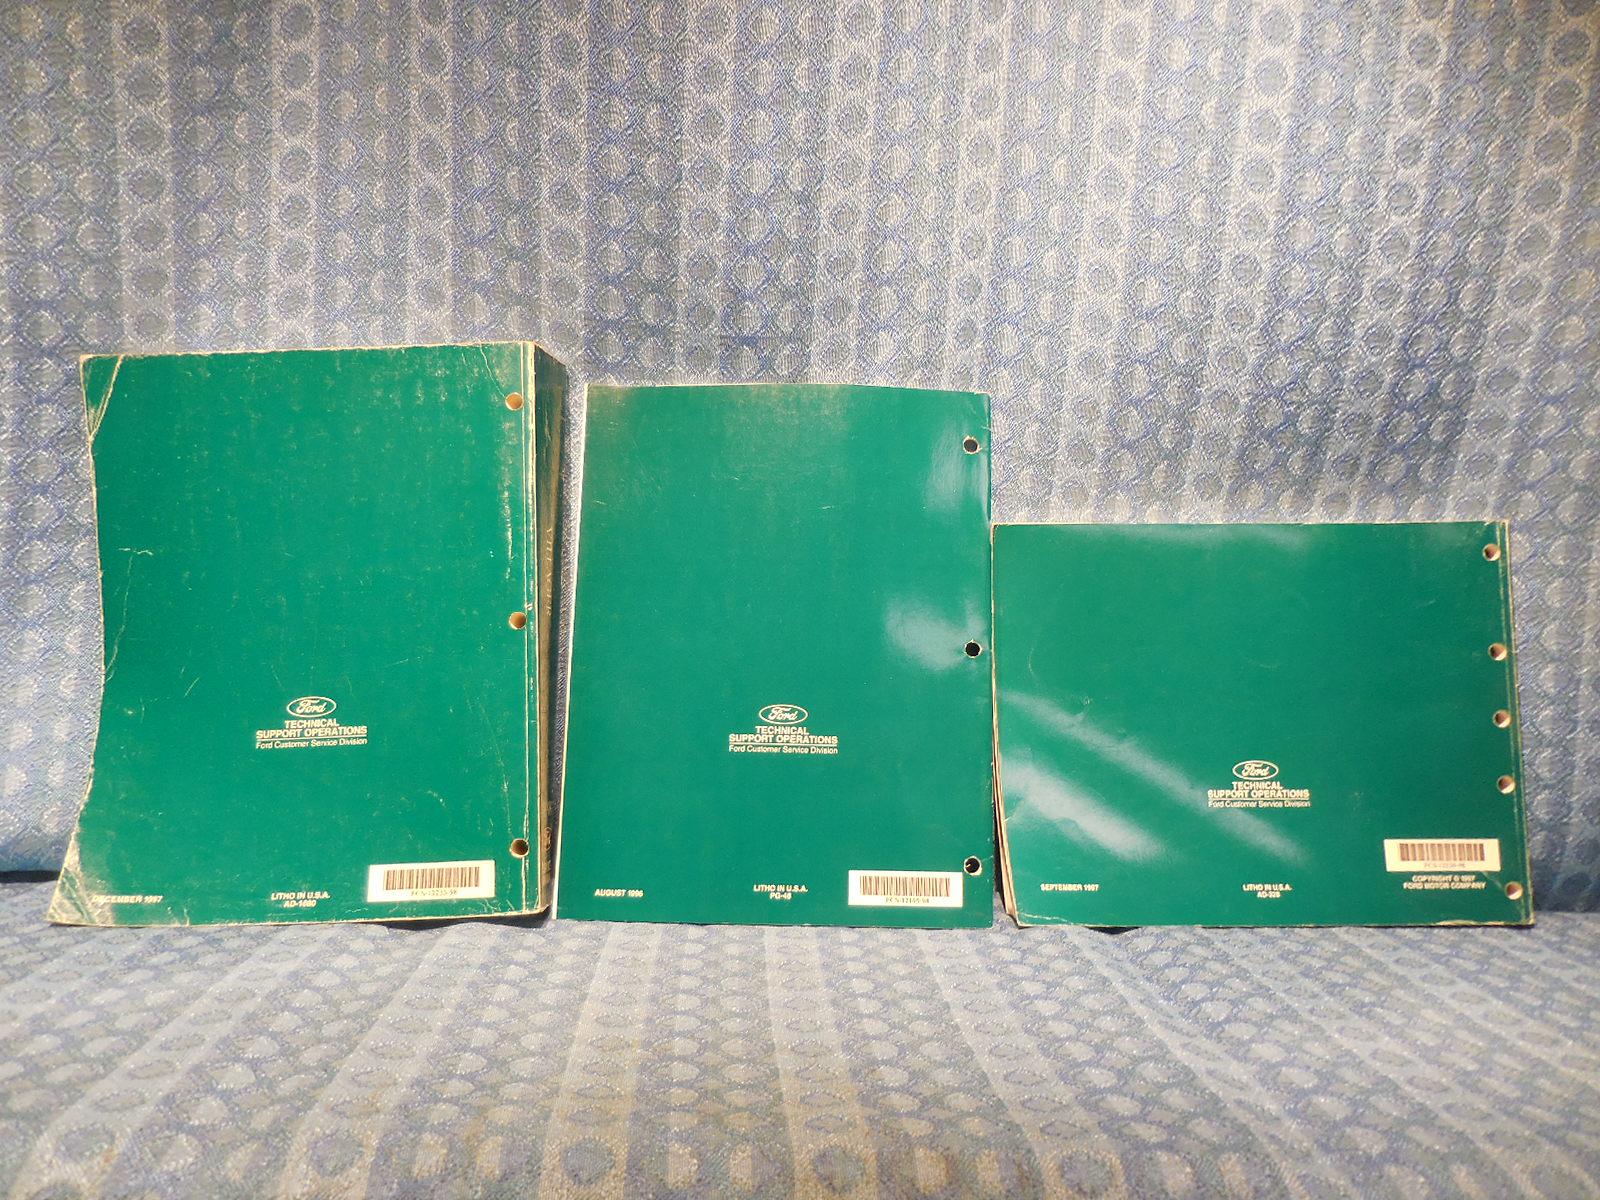 ... Array - scott speedy green 3000 manual ebook rh scott speedy green 3000  manual ebook nitroroc